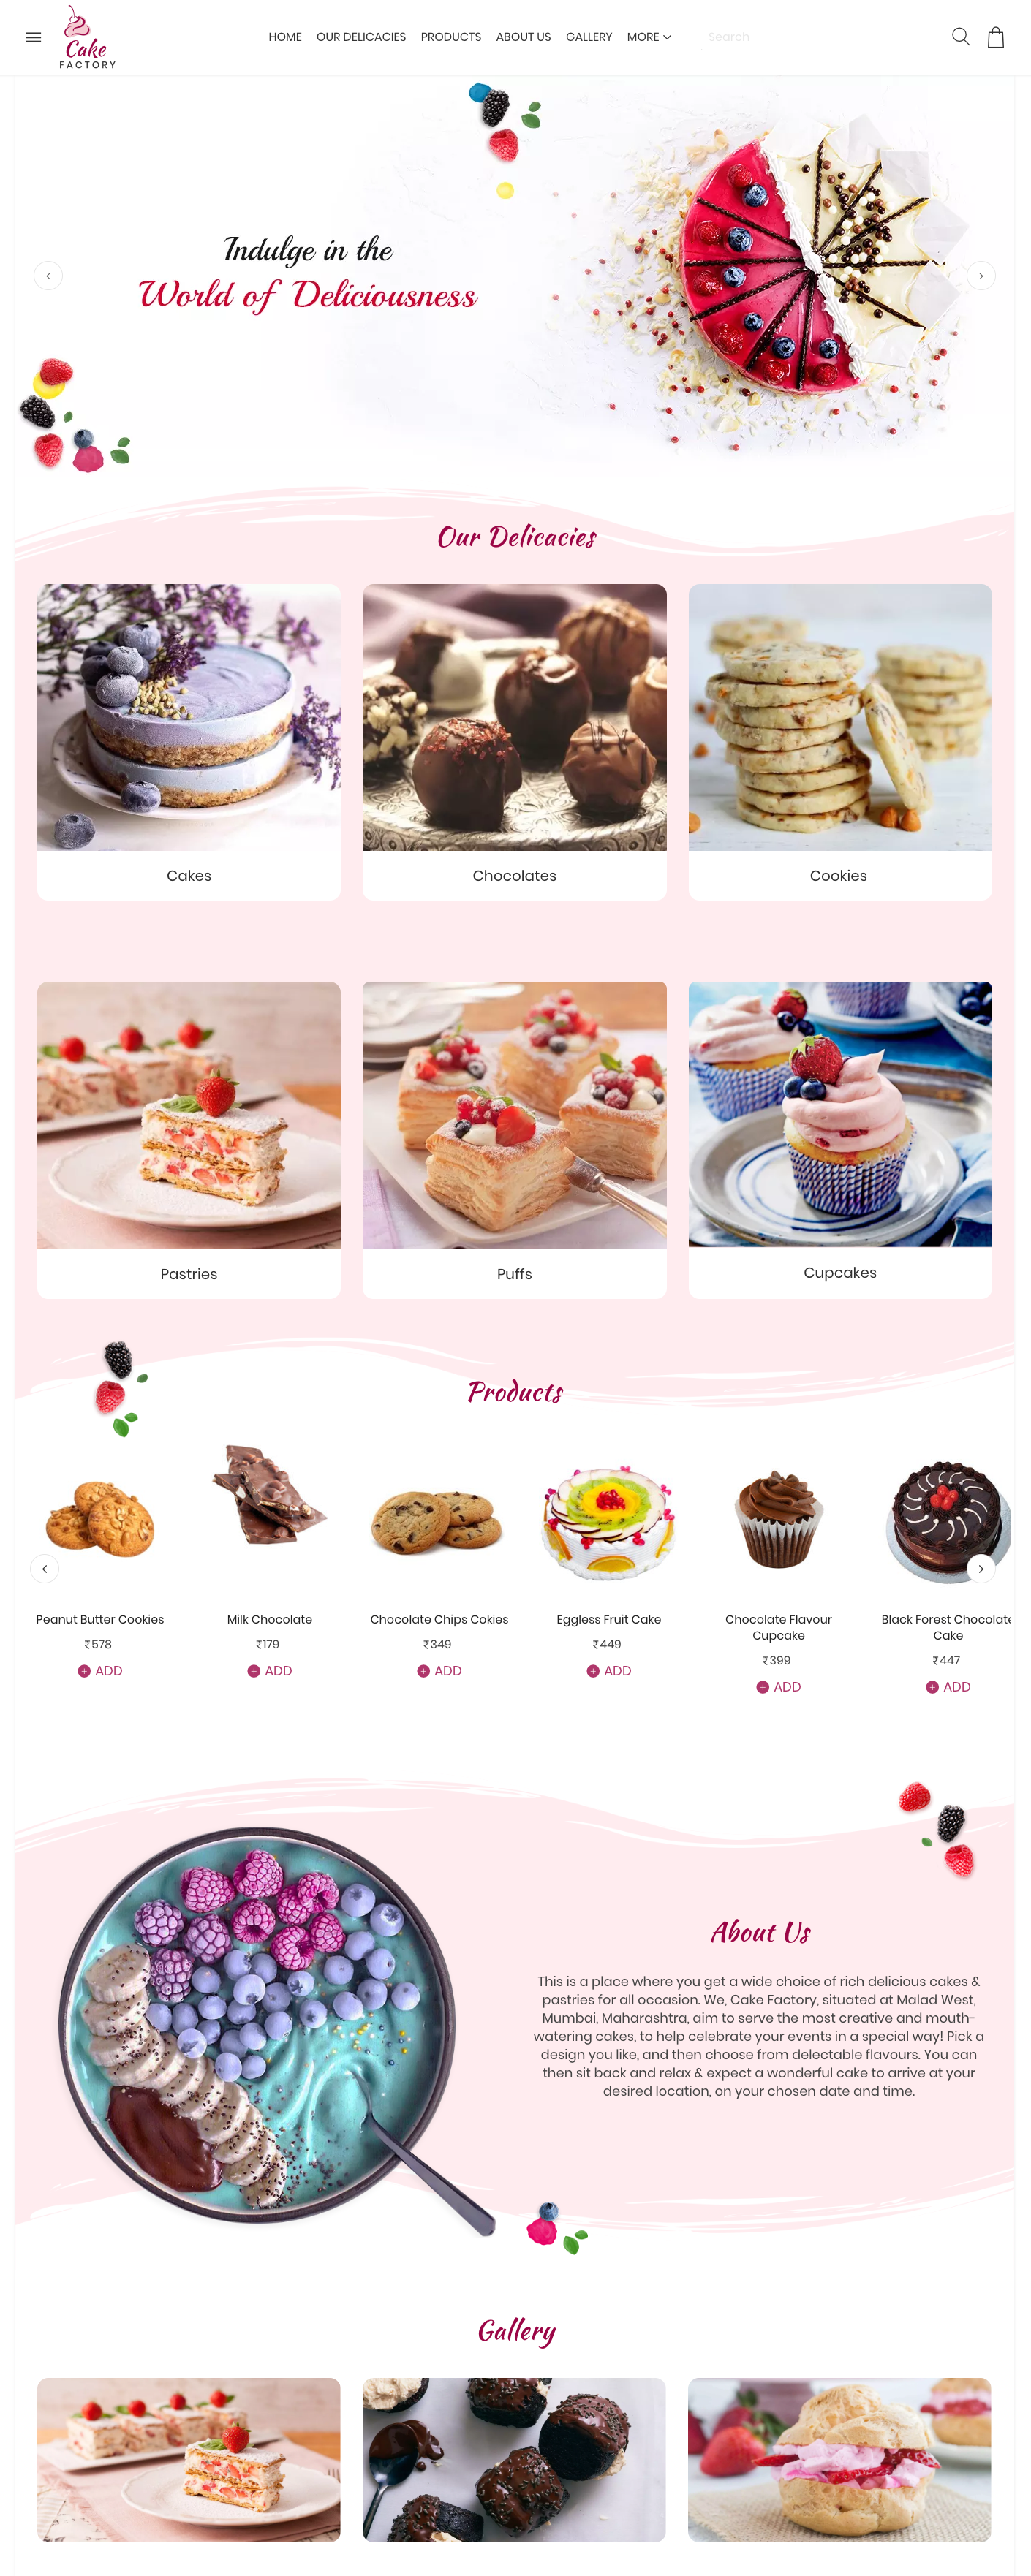 Best Free Cake Shop Website Templates Bakery Website Cake Shop Design Cake Shop